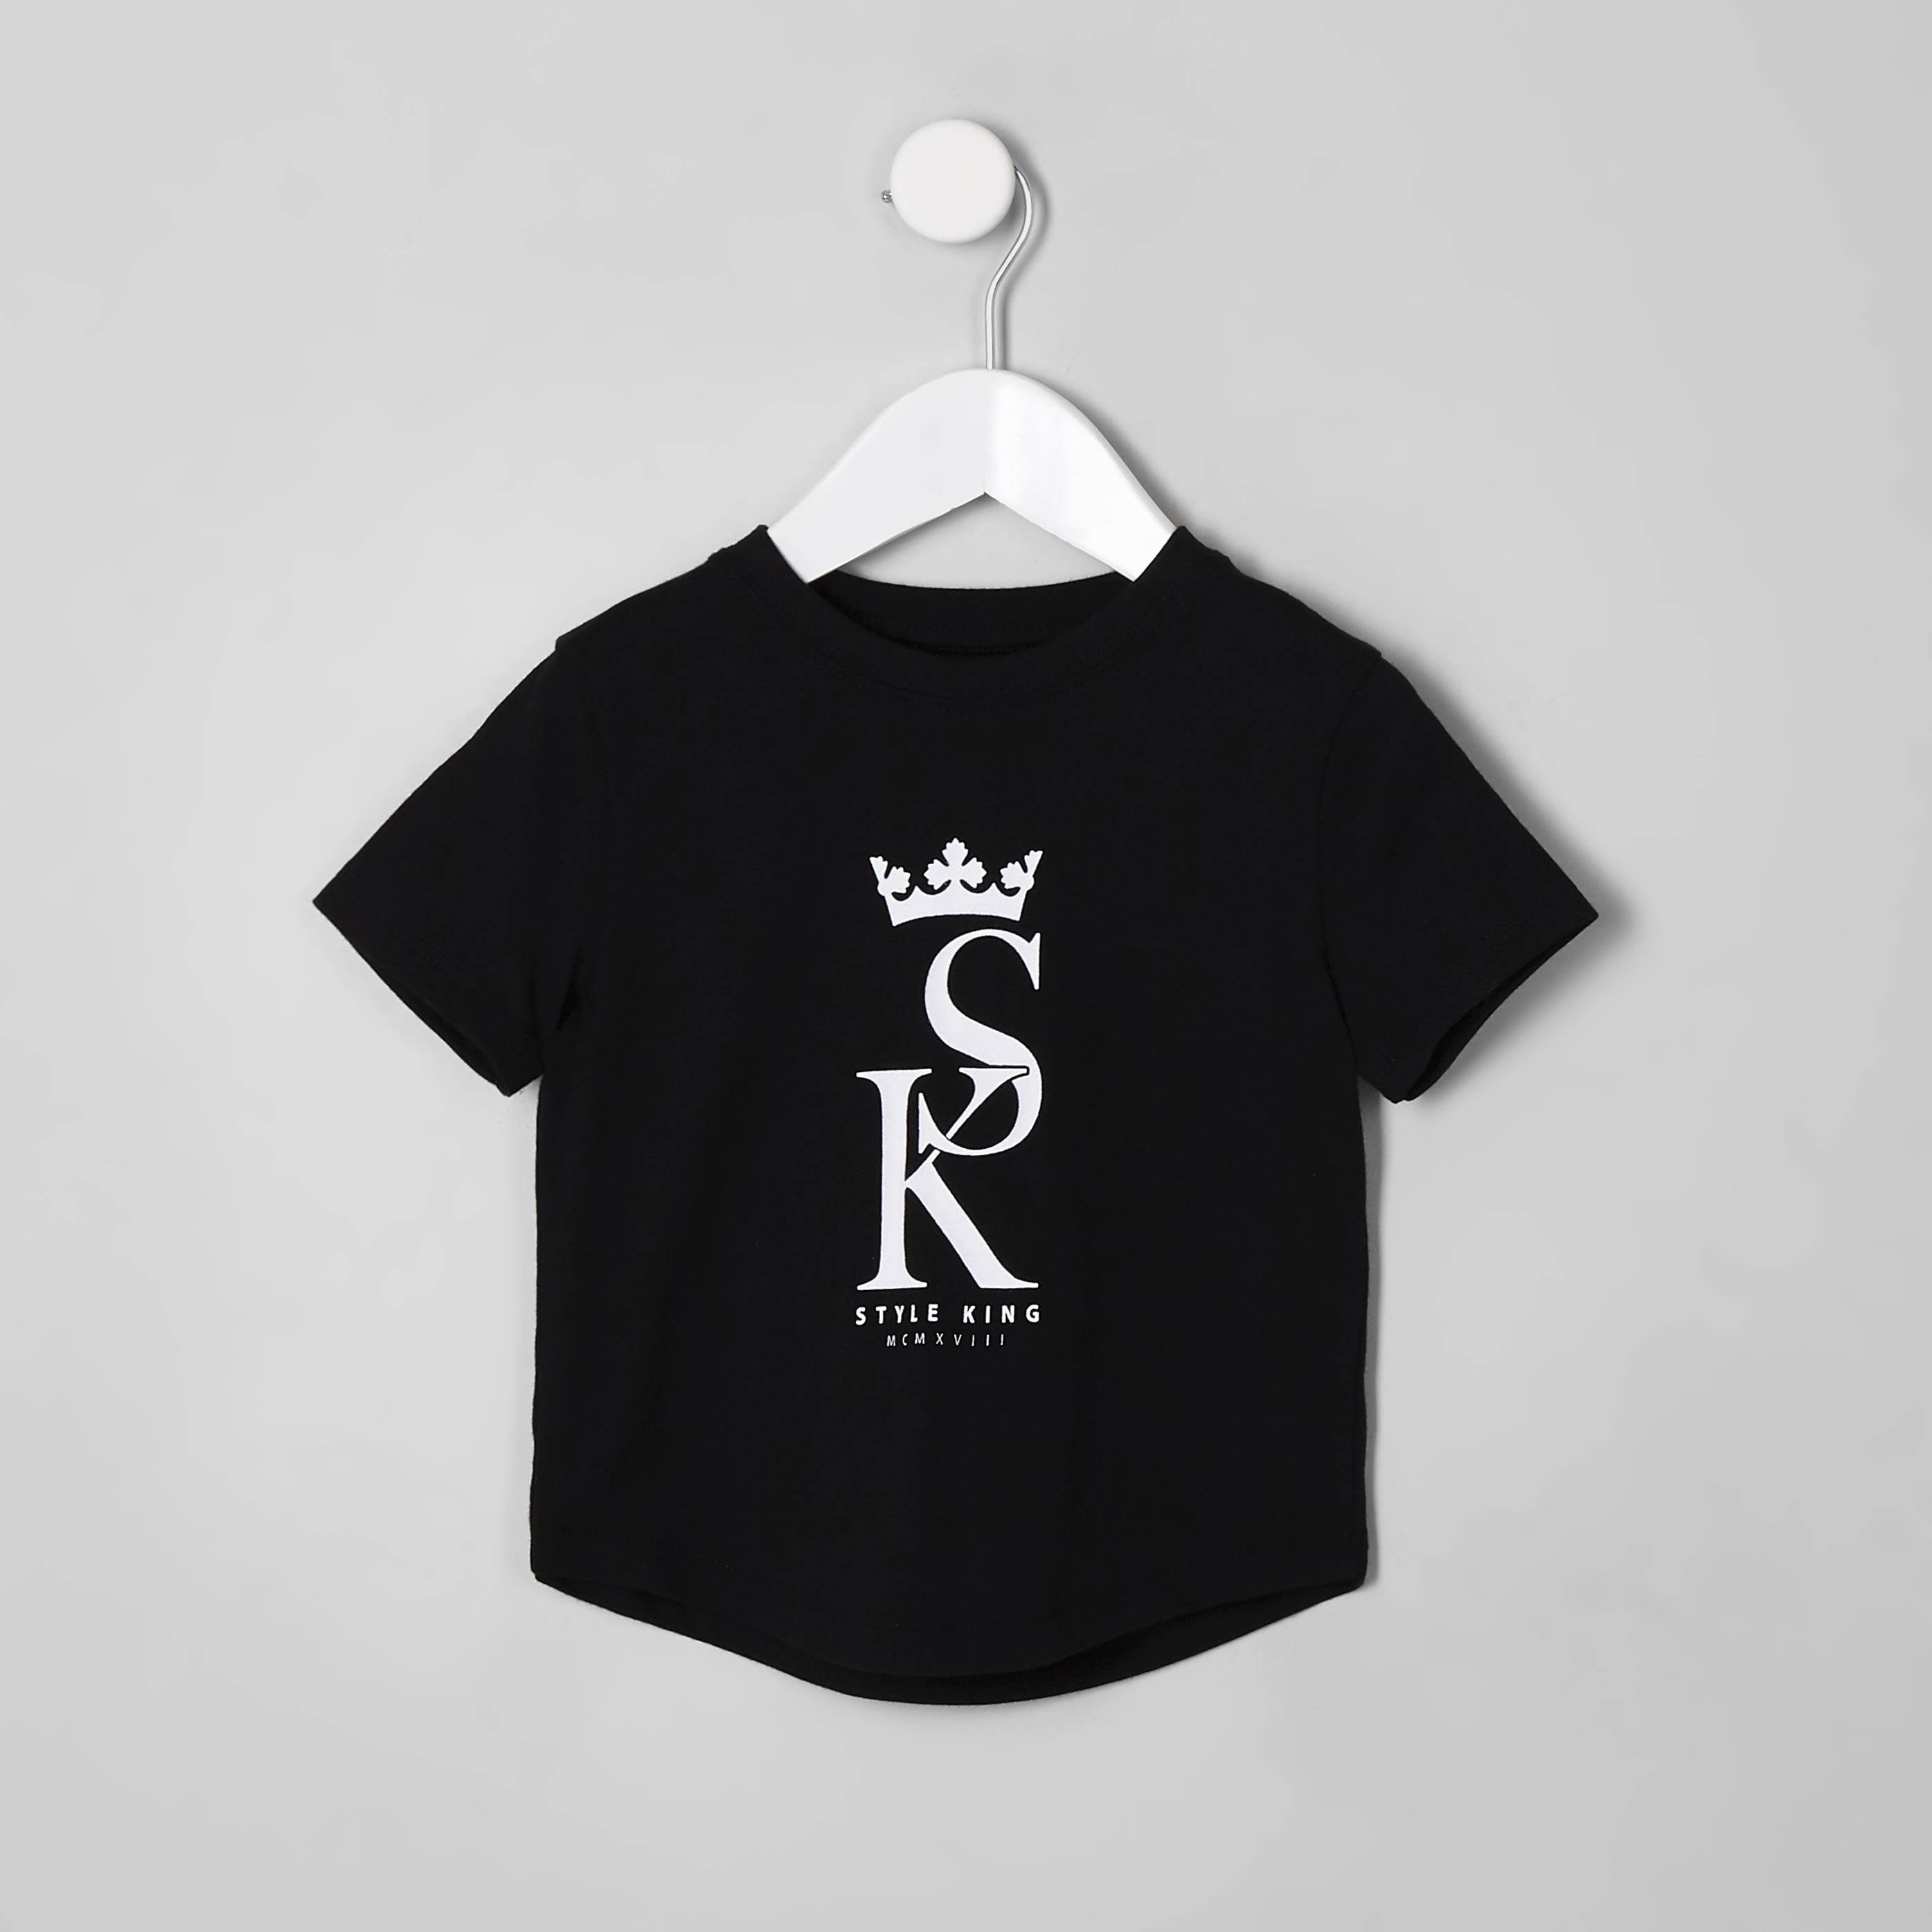 River Island Baby Boys Black 'style king' T-shirt (3-6 Mths)